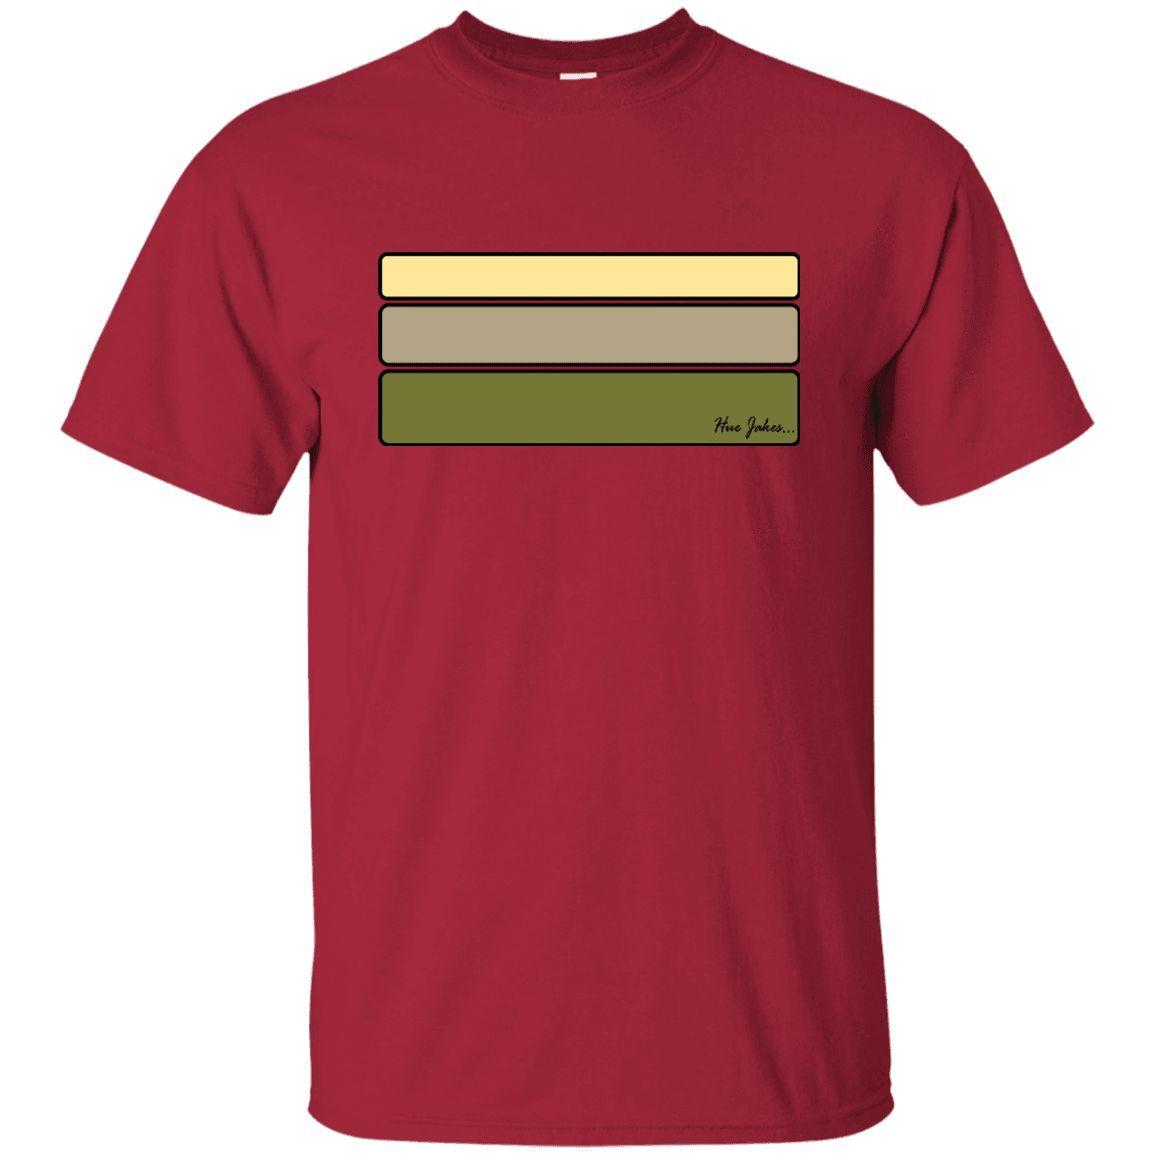 Gildan Youth Ultra Cotton T Shirt Cotton Tshirt T Shirt Mens Tops